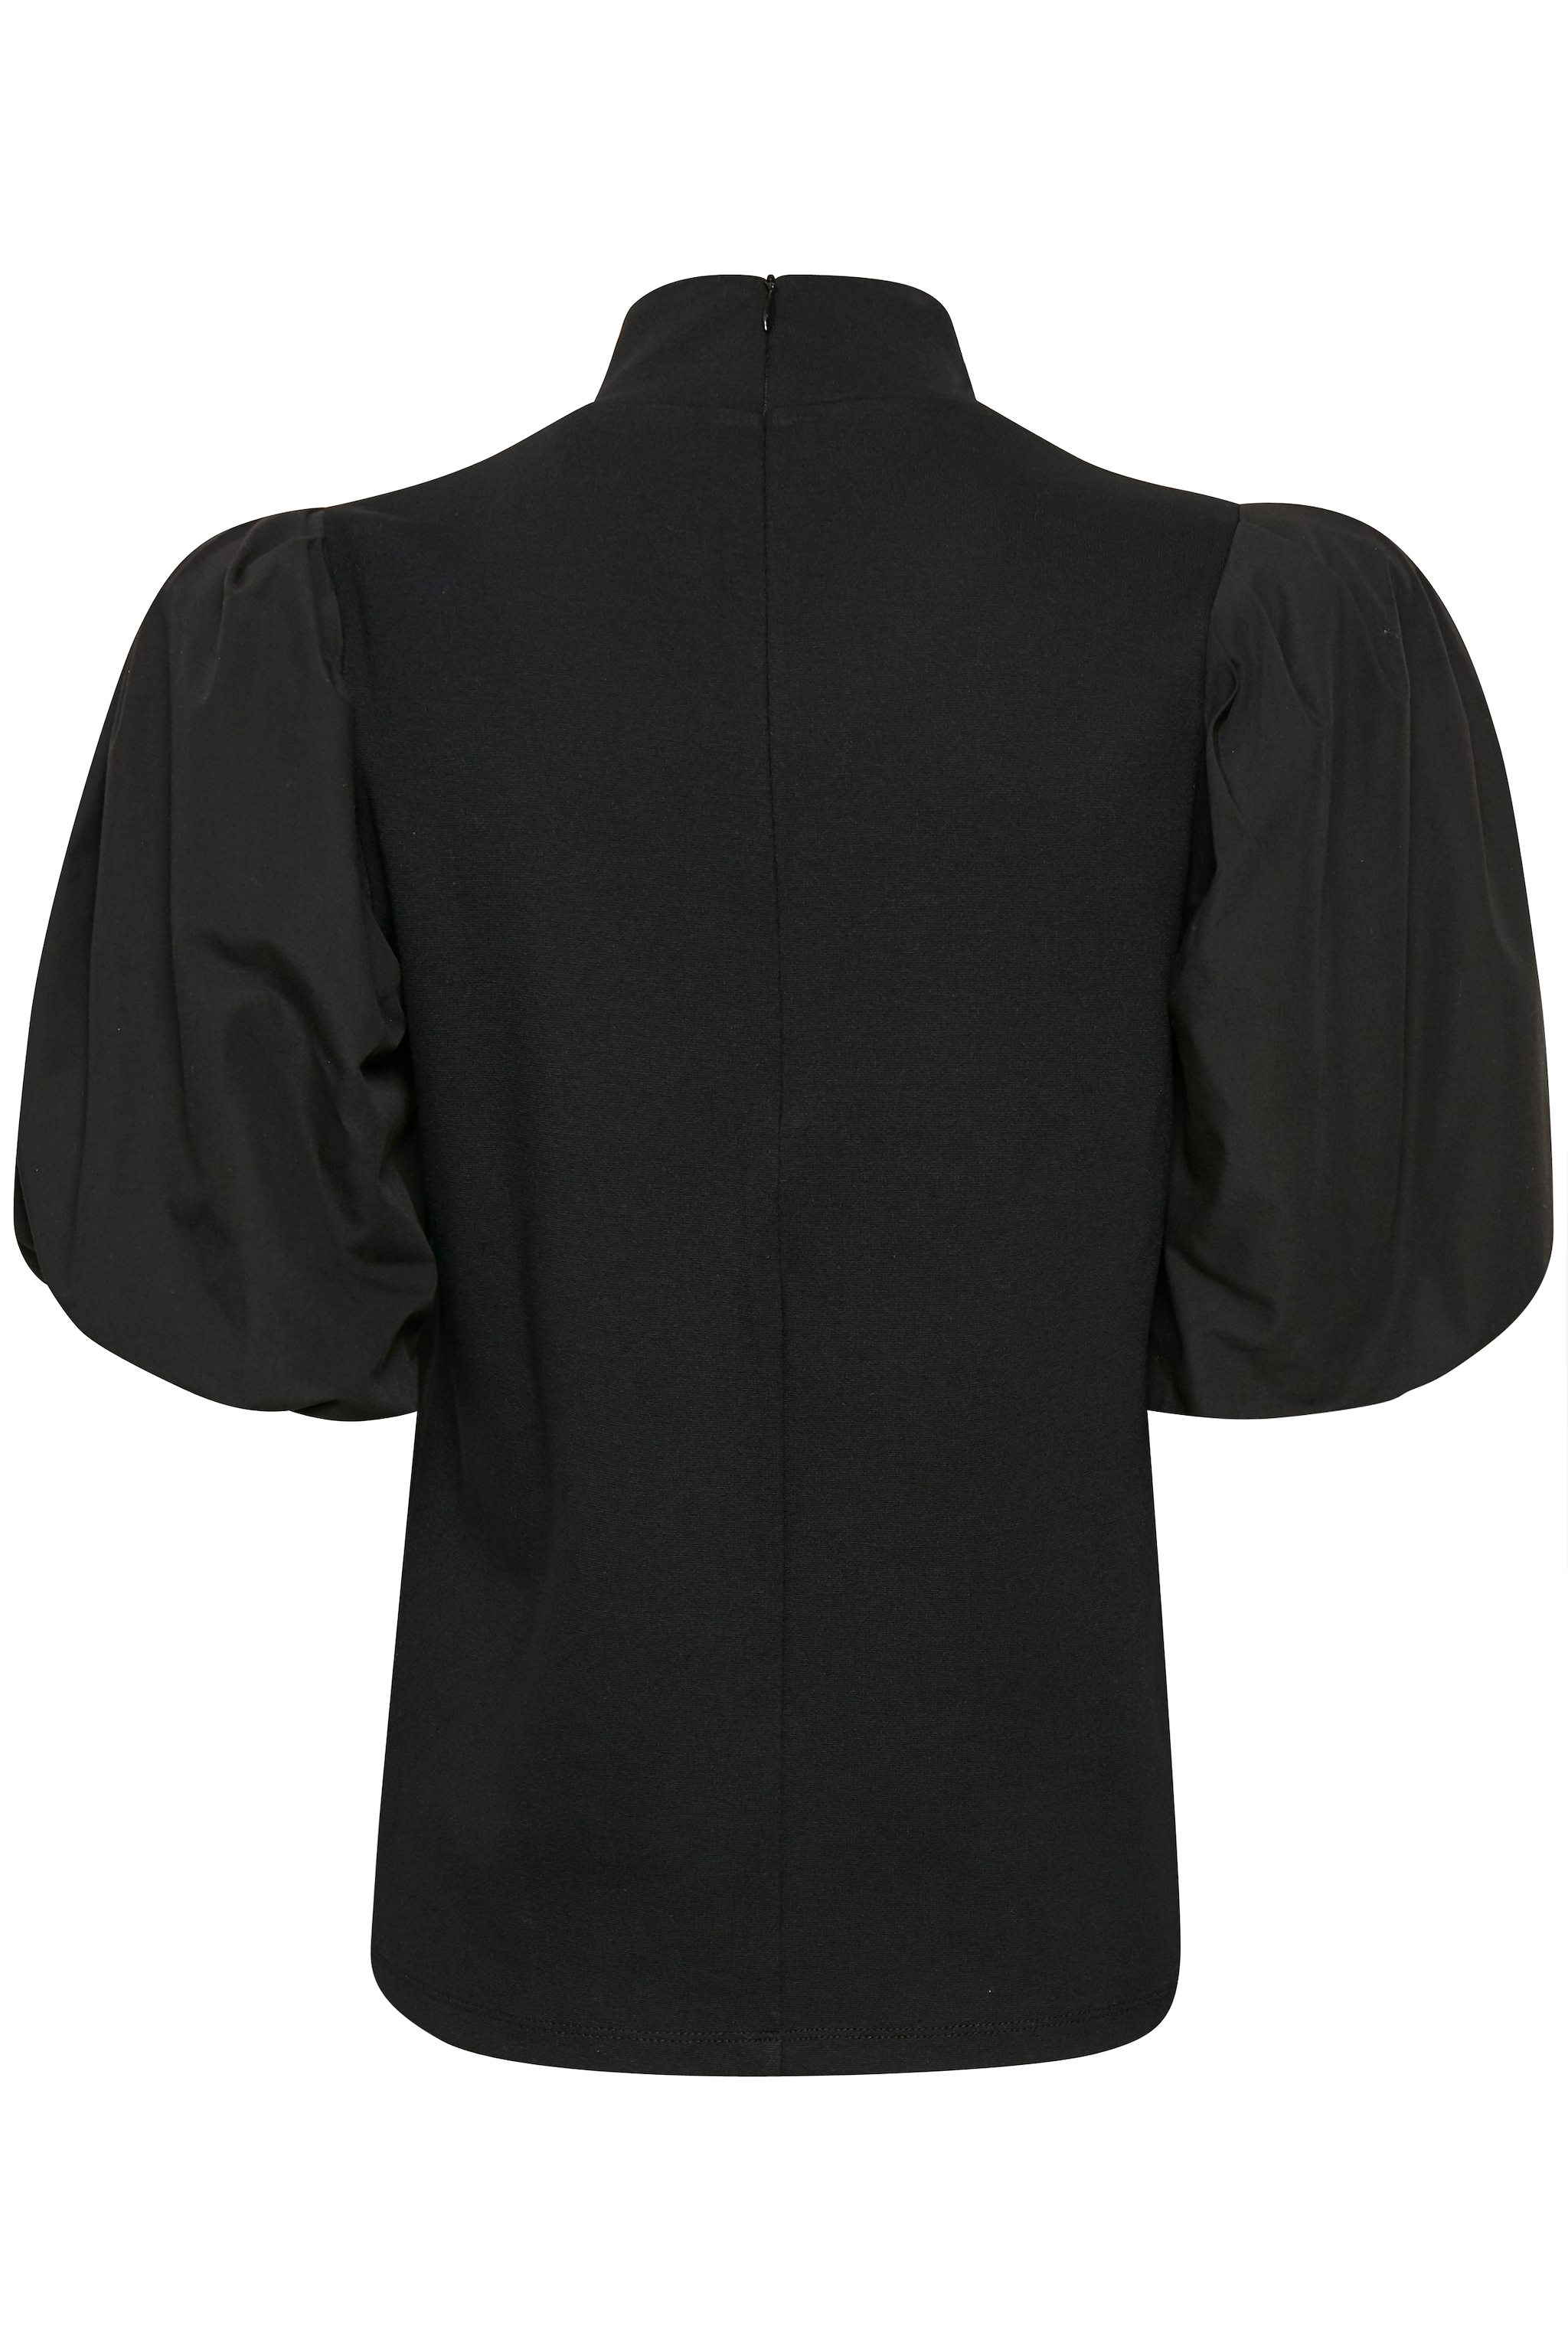 Gestuz Bima top, black, small